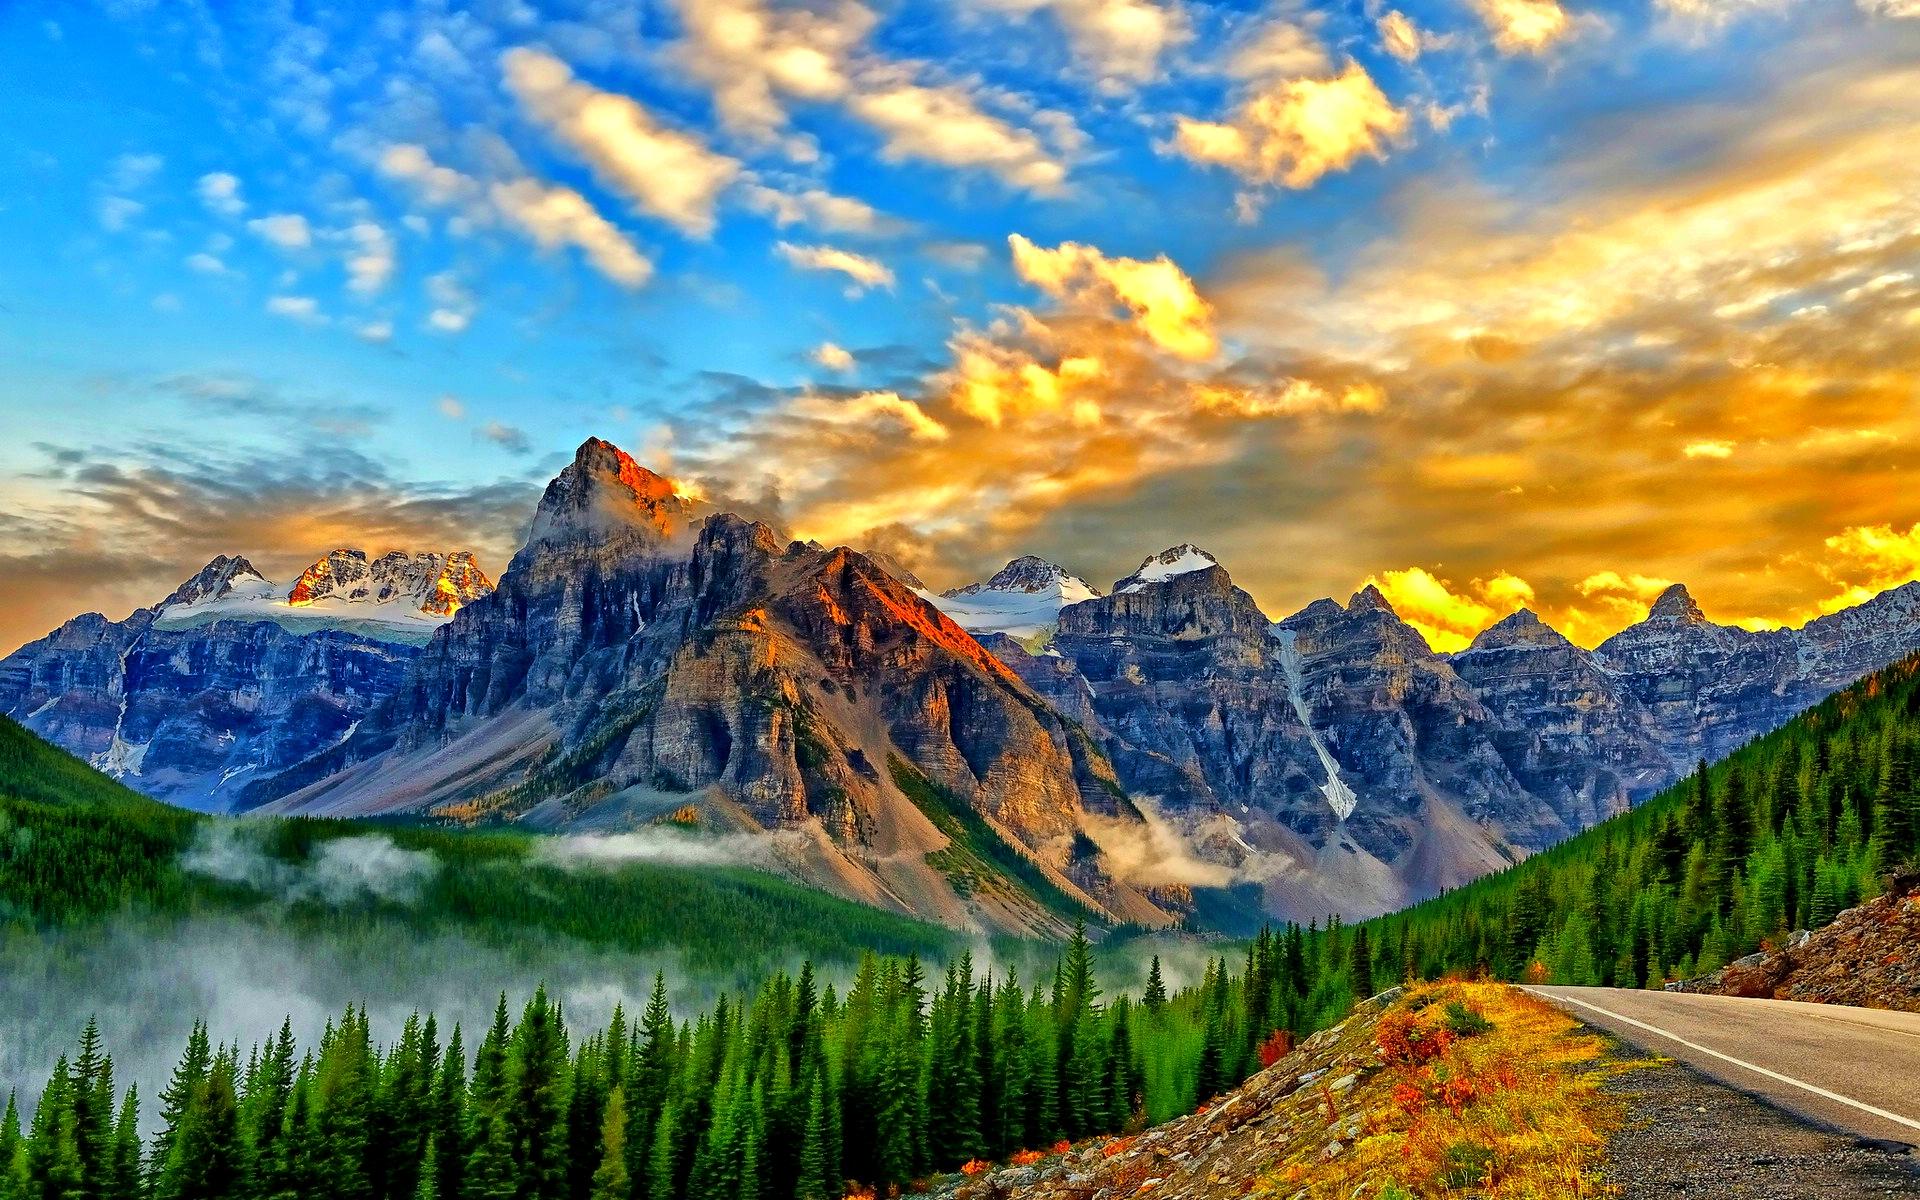 Lake Mountain Background Hd